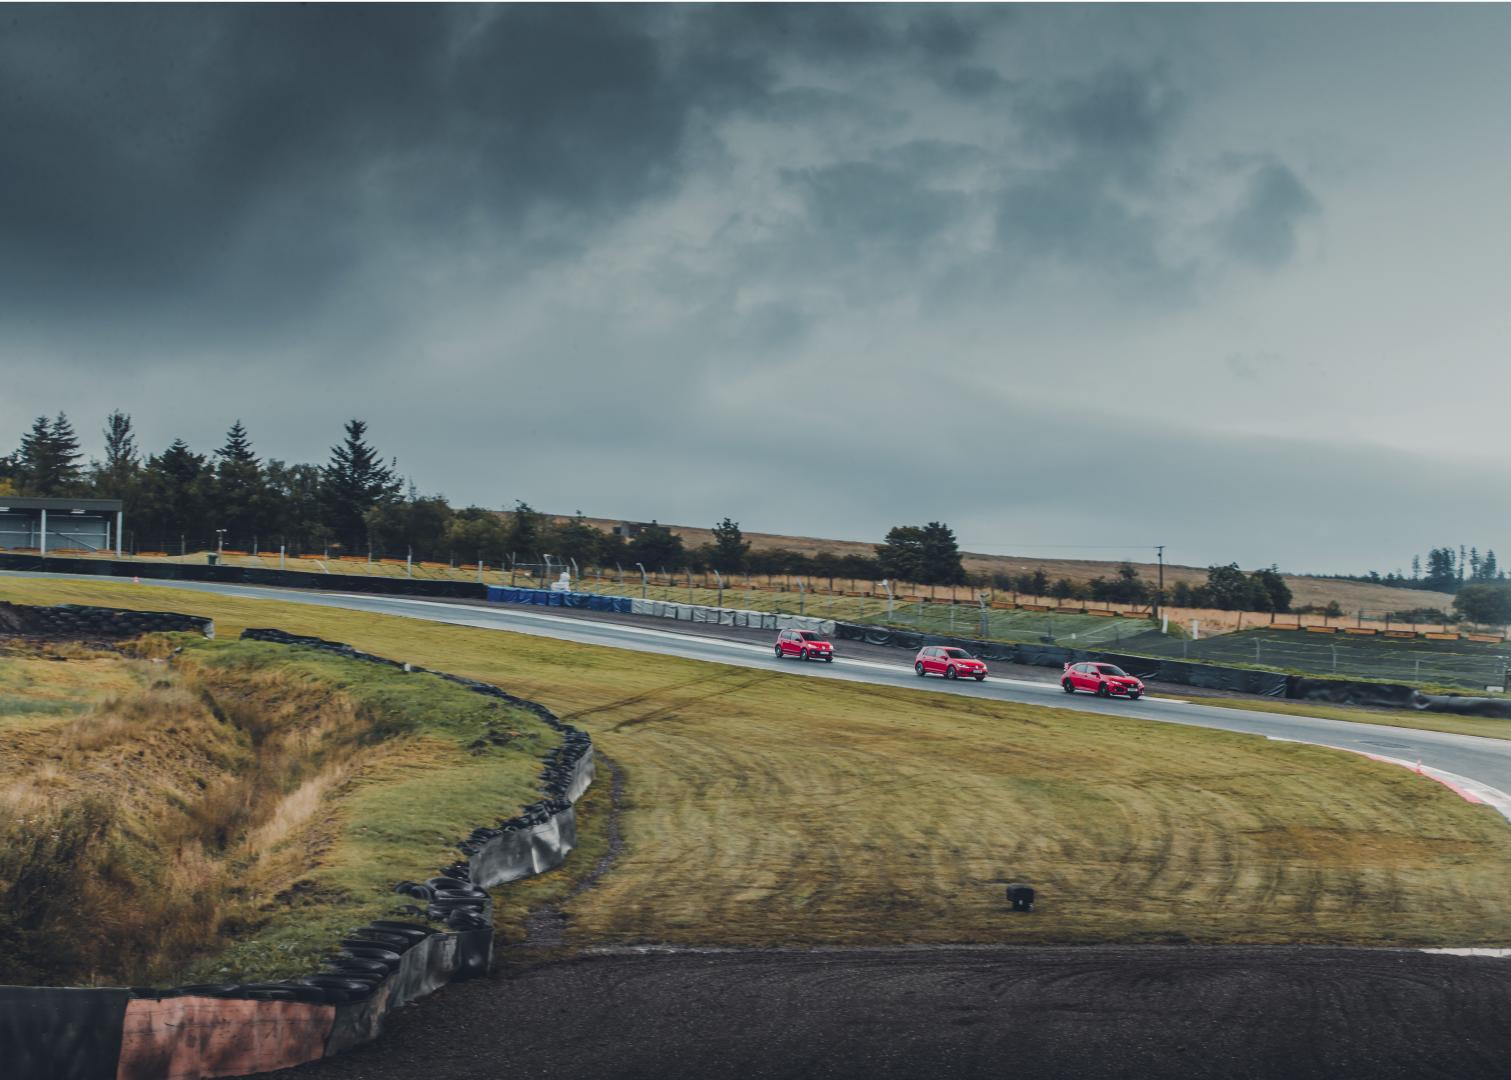 Hete Hatches (VW vs Honda vs VW)